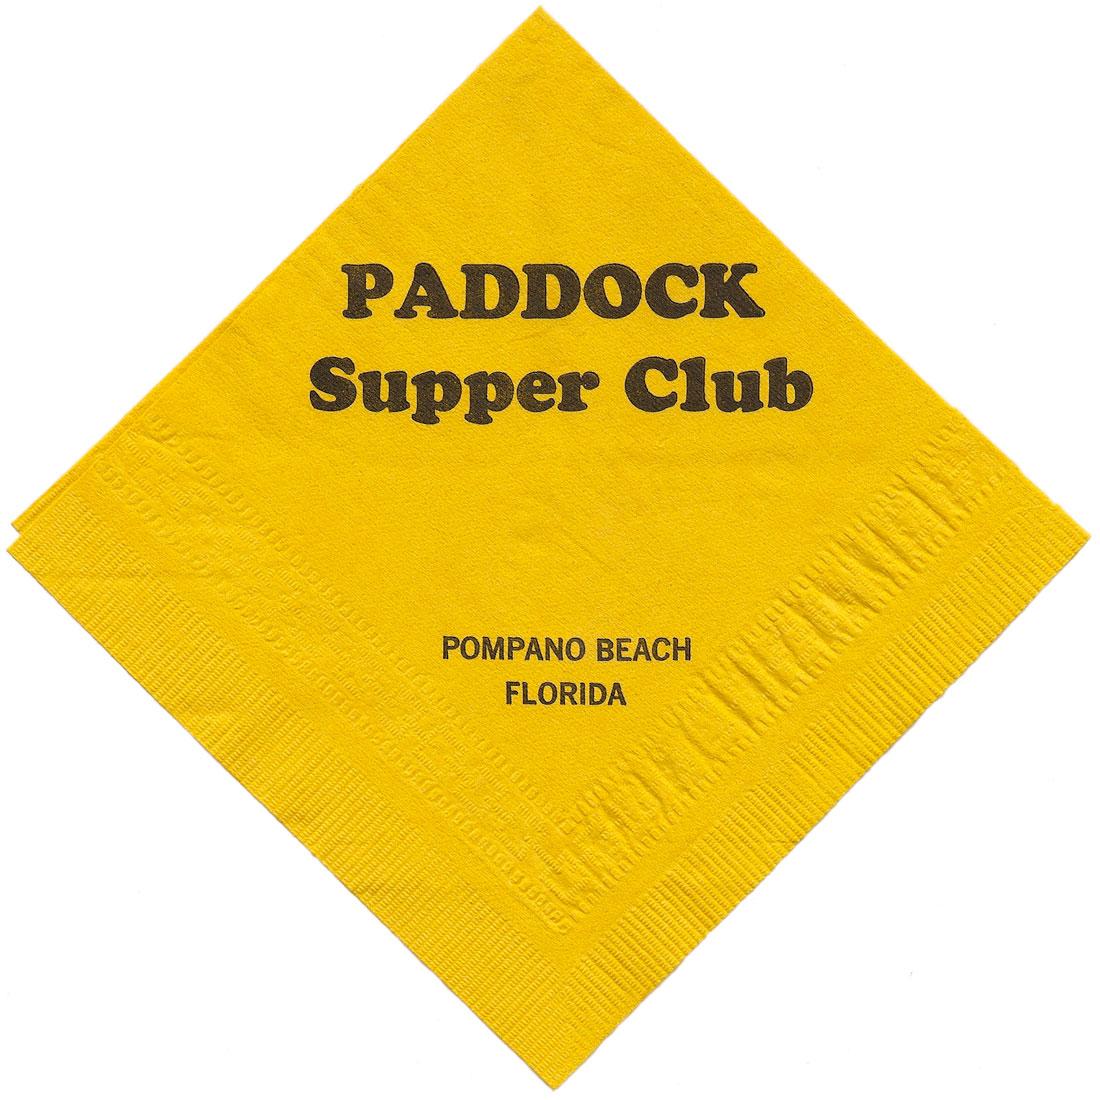 Paddock napkin